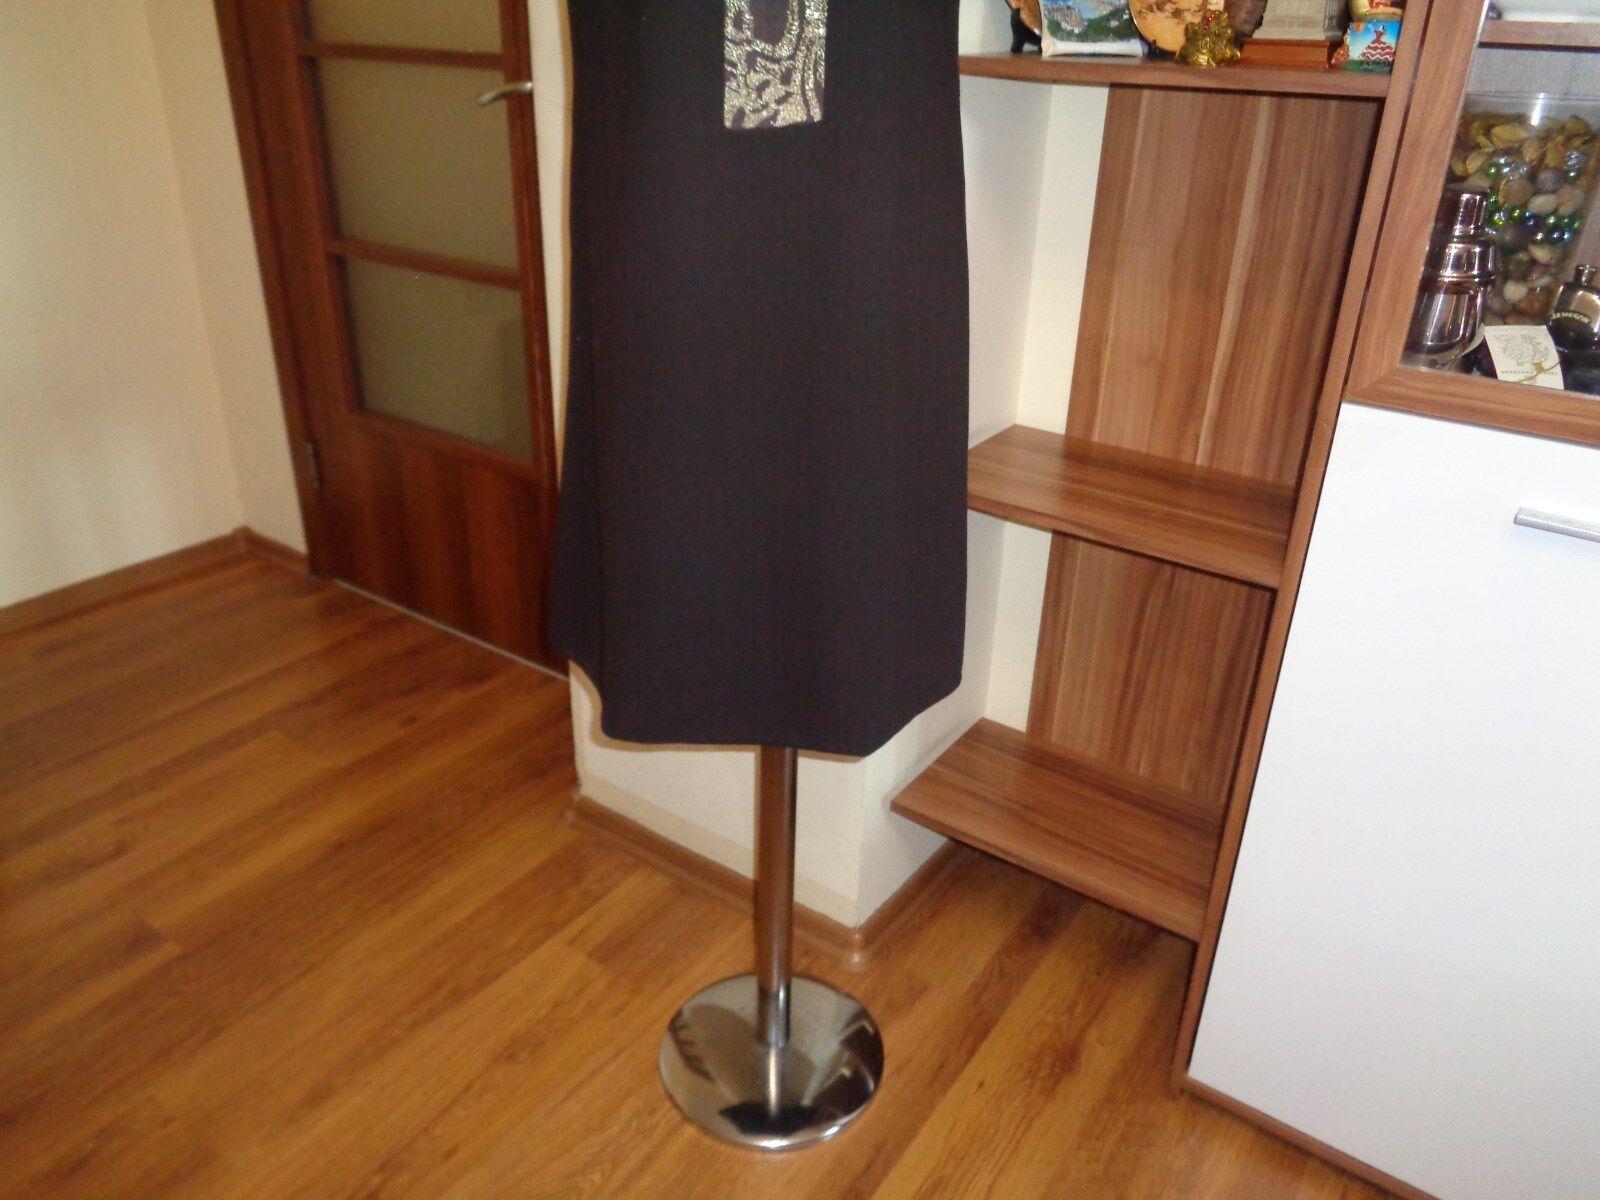 BADGLEY BADGLEY BADGLEY MISCHKA DARK BROWN WOOL CREPE A-LINE DRESS WITH gold METALLIC EMBROIDERY 34d3b2